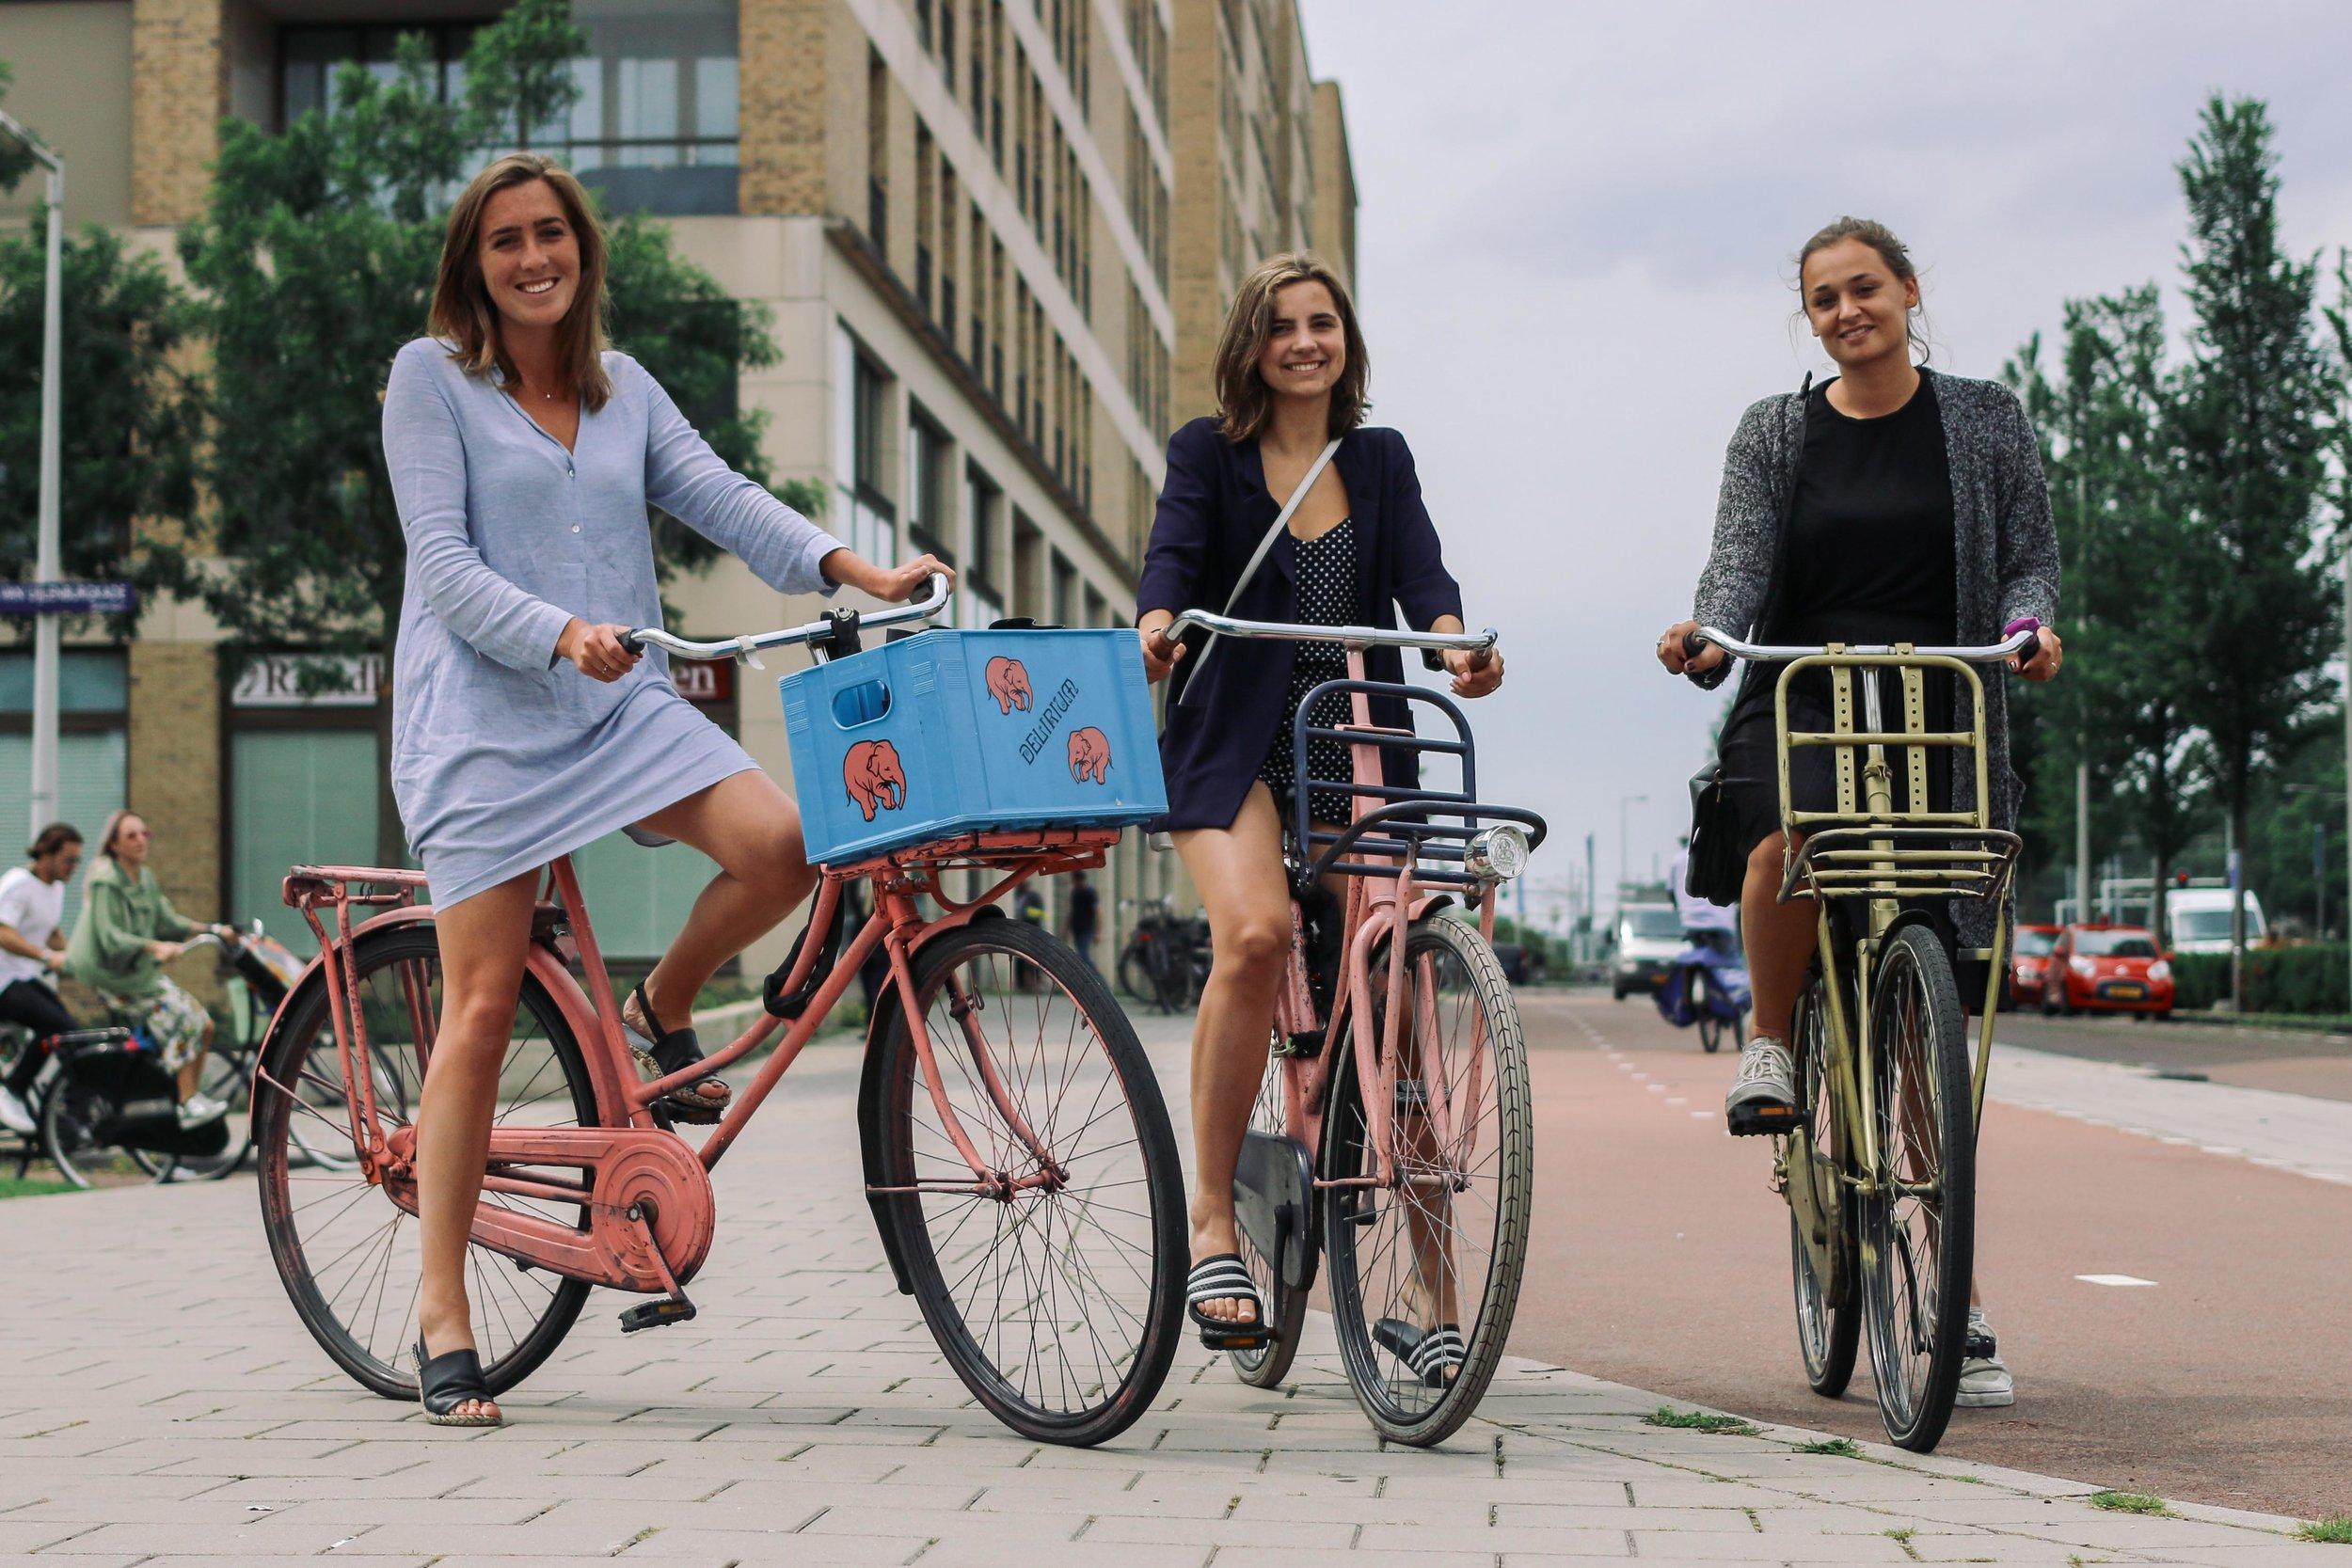 Street fashion stories_Imaginealady_amsterdam_bike